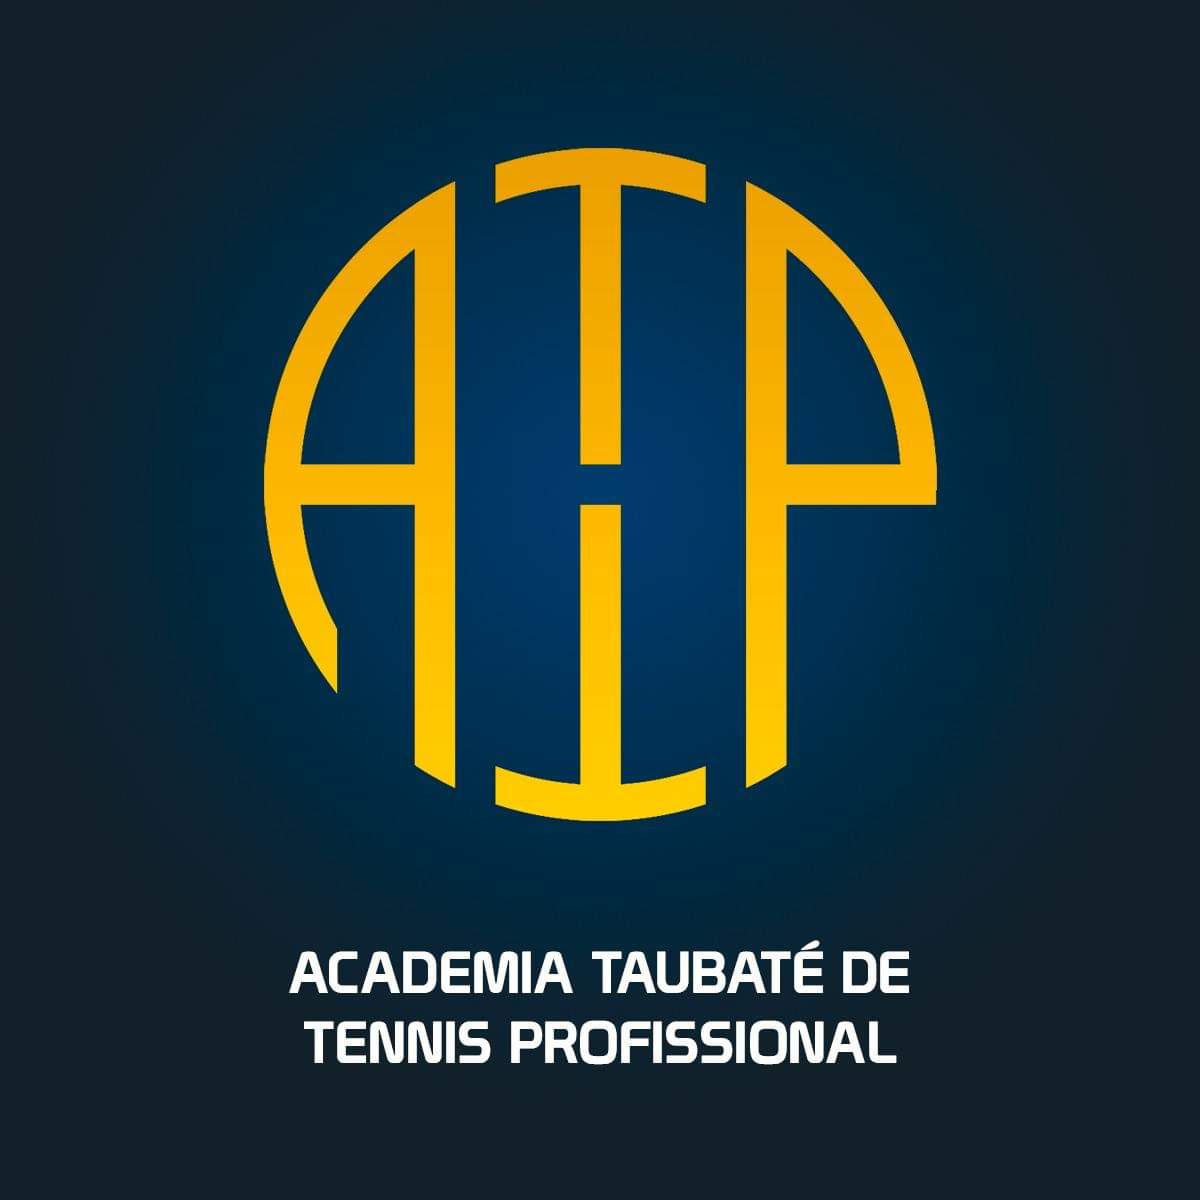 Academia Taubaté de Tennis Profissional